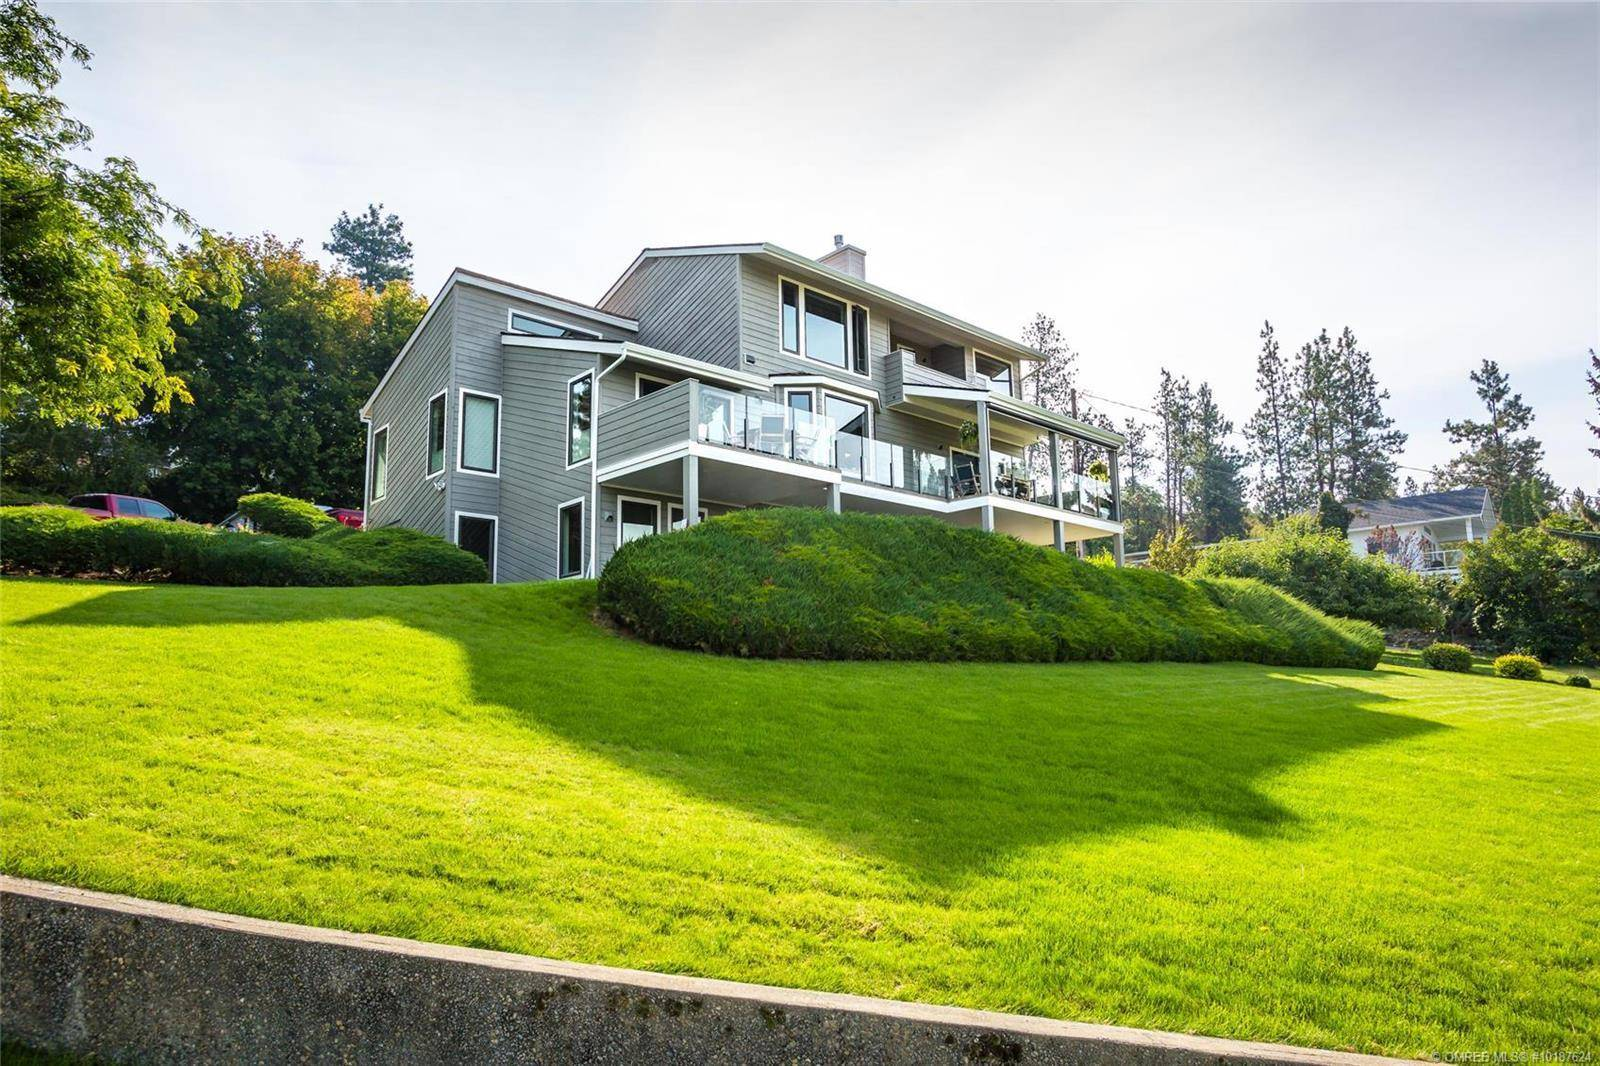 House for sale at 1381 Lewis Rd Kelowna British Columbia - MLS: 10187624